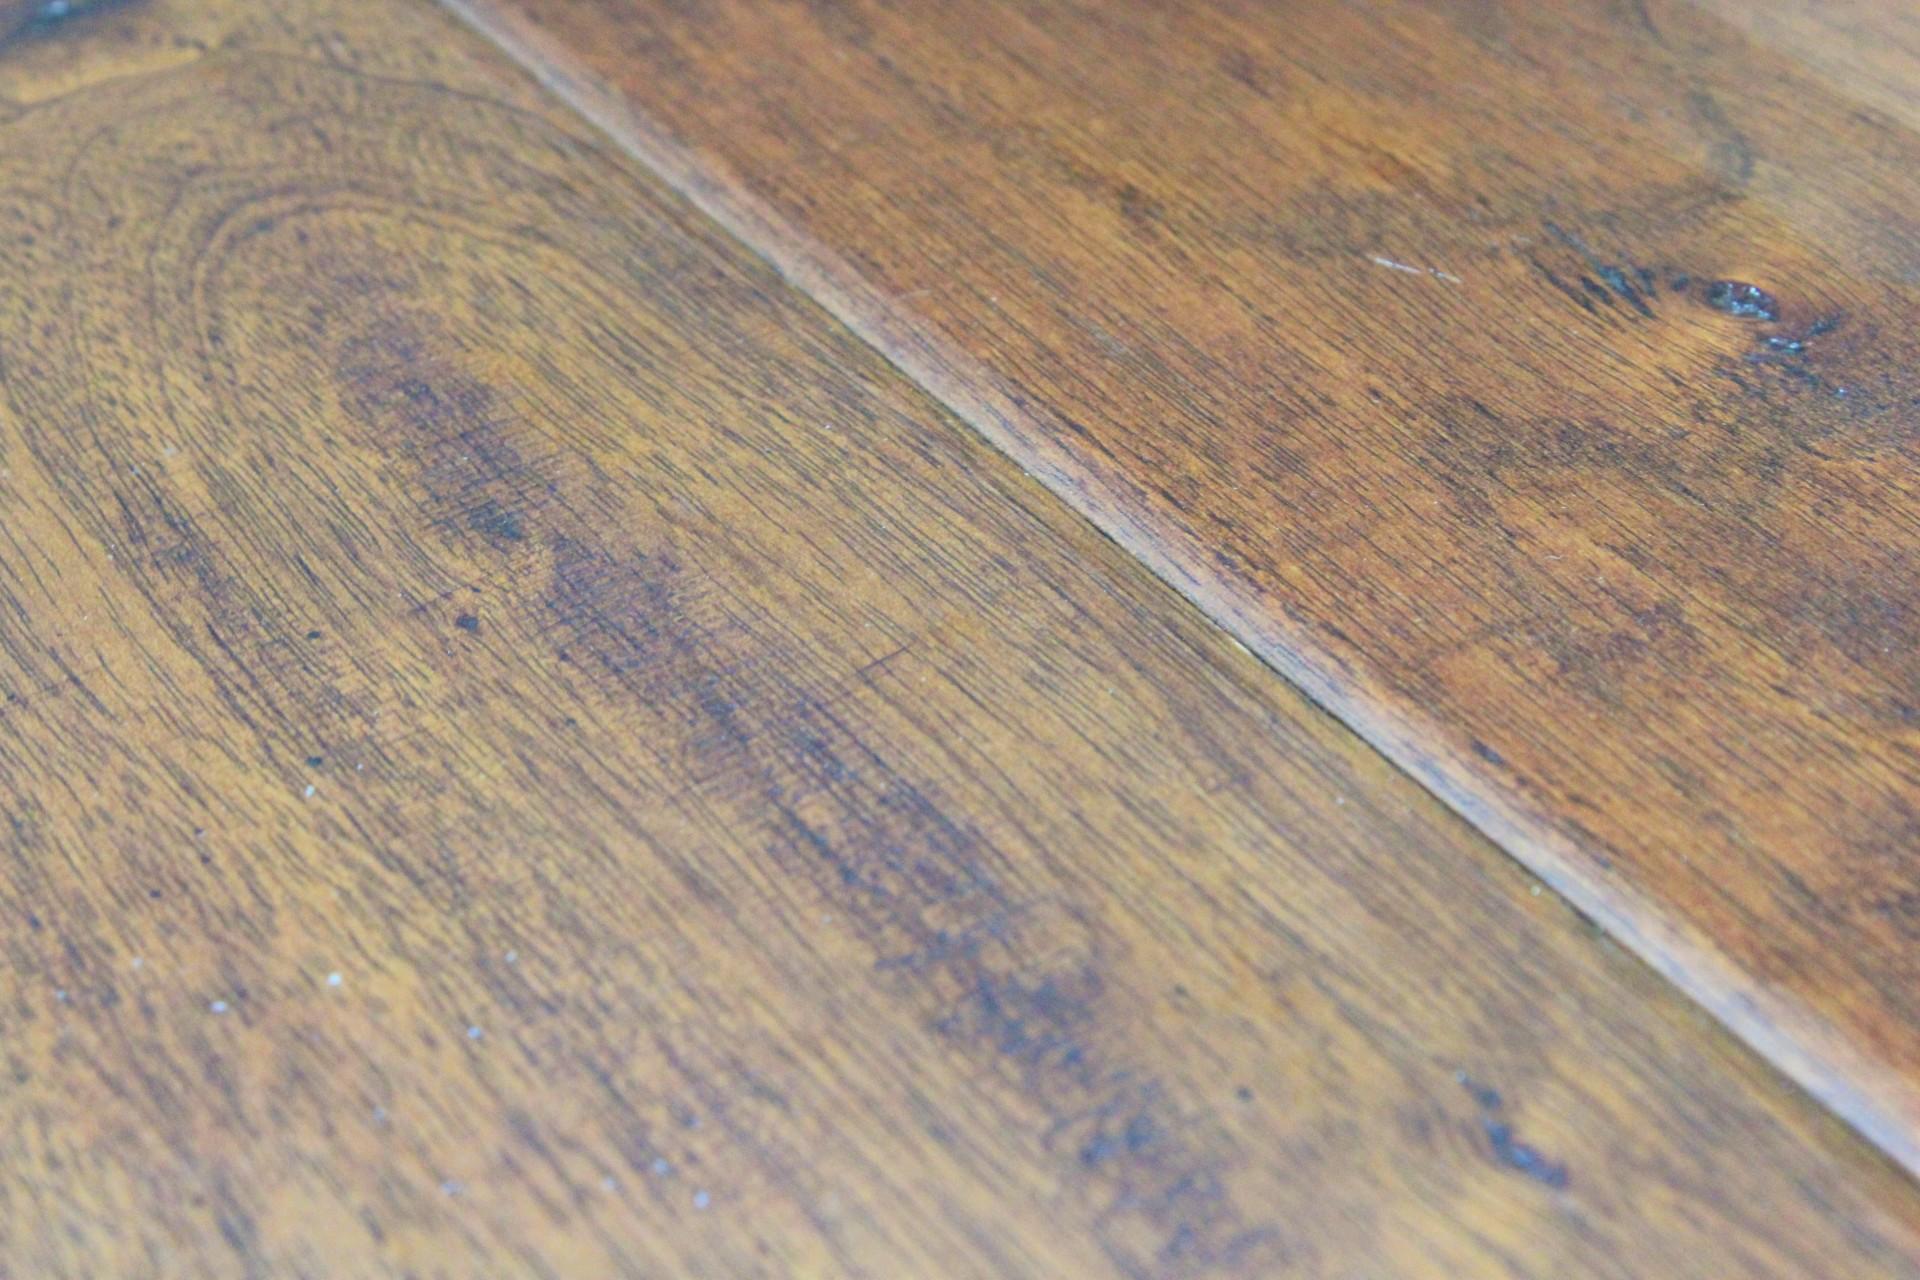 Hardwood, prefinished floor, engineered wood, solid wood, lifestyle, hard surface, prefinished hardwood, prefinished wood, home, design, interior design, wood floor design, anderson